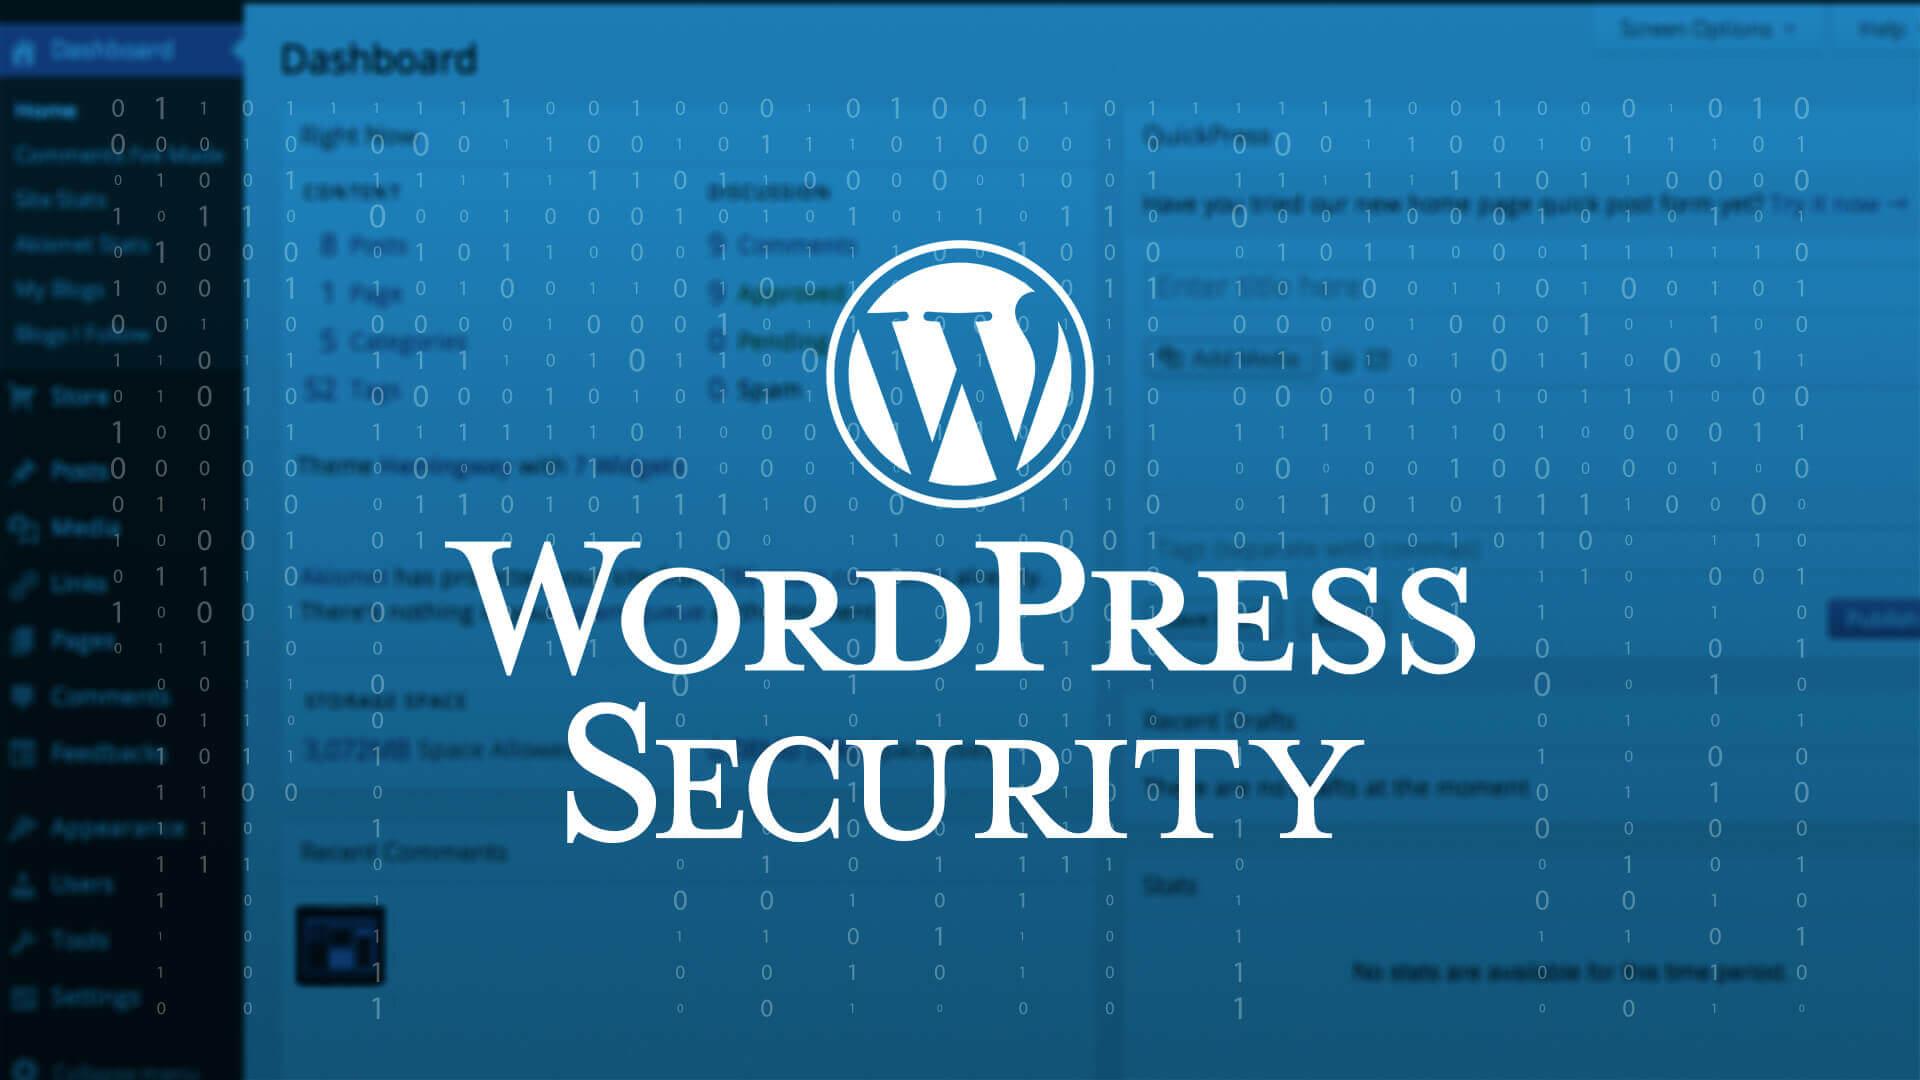 Wordpress Security 2019